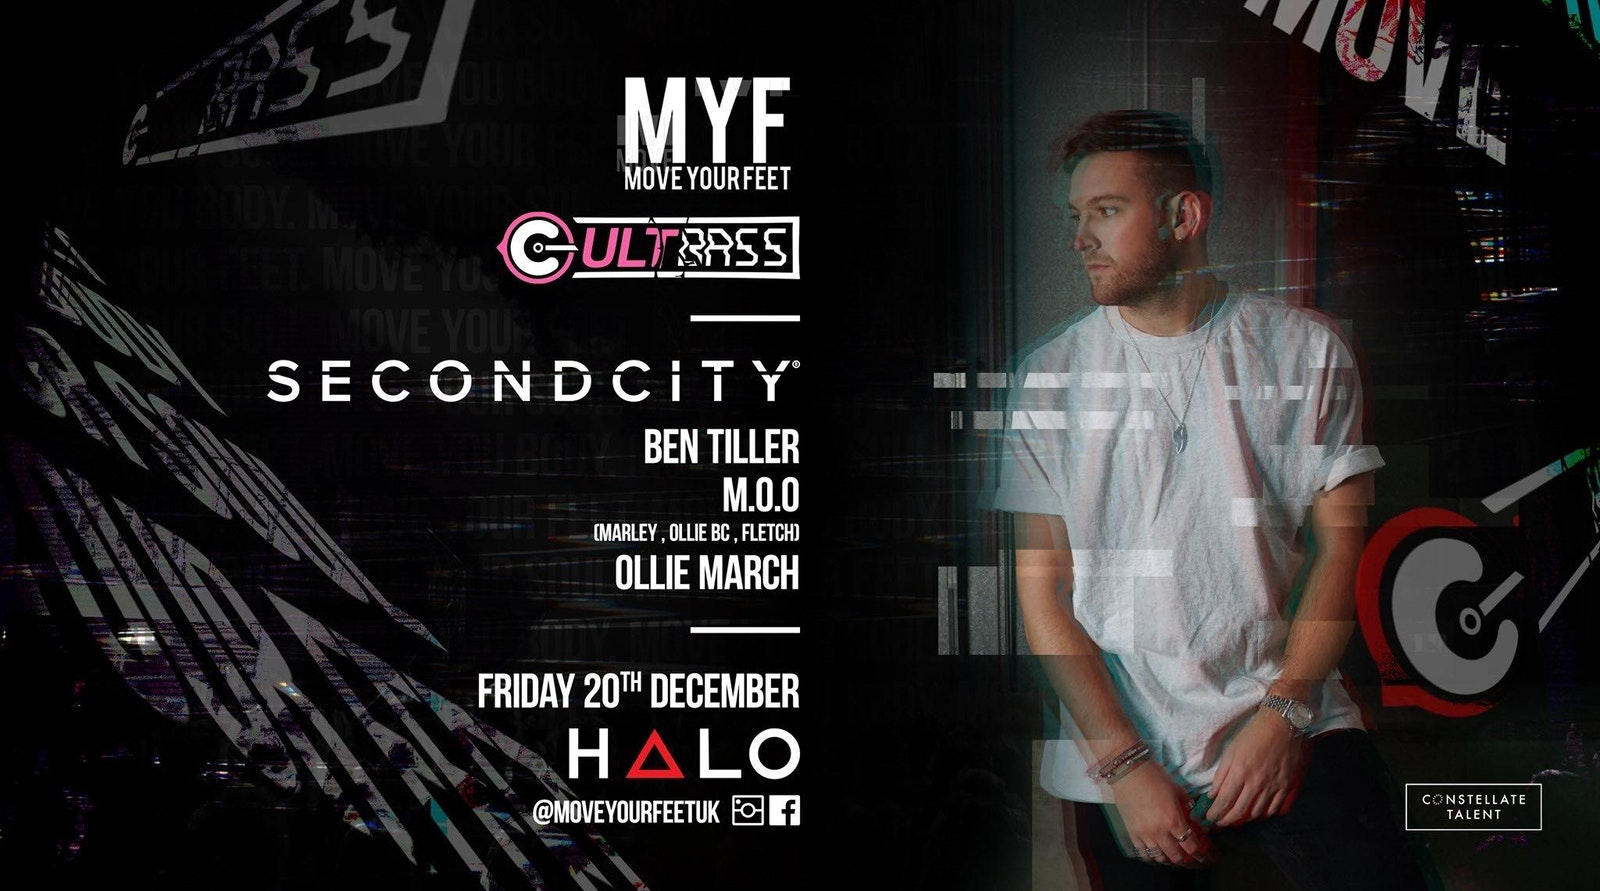 MYF & Cultbass present Second City